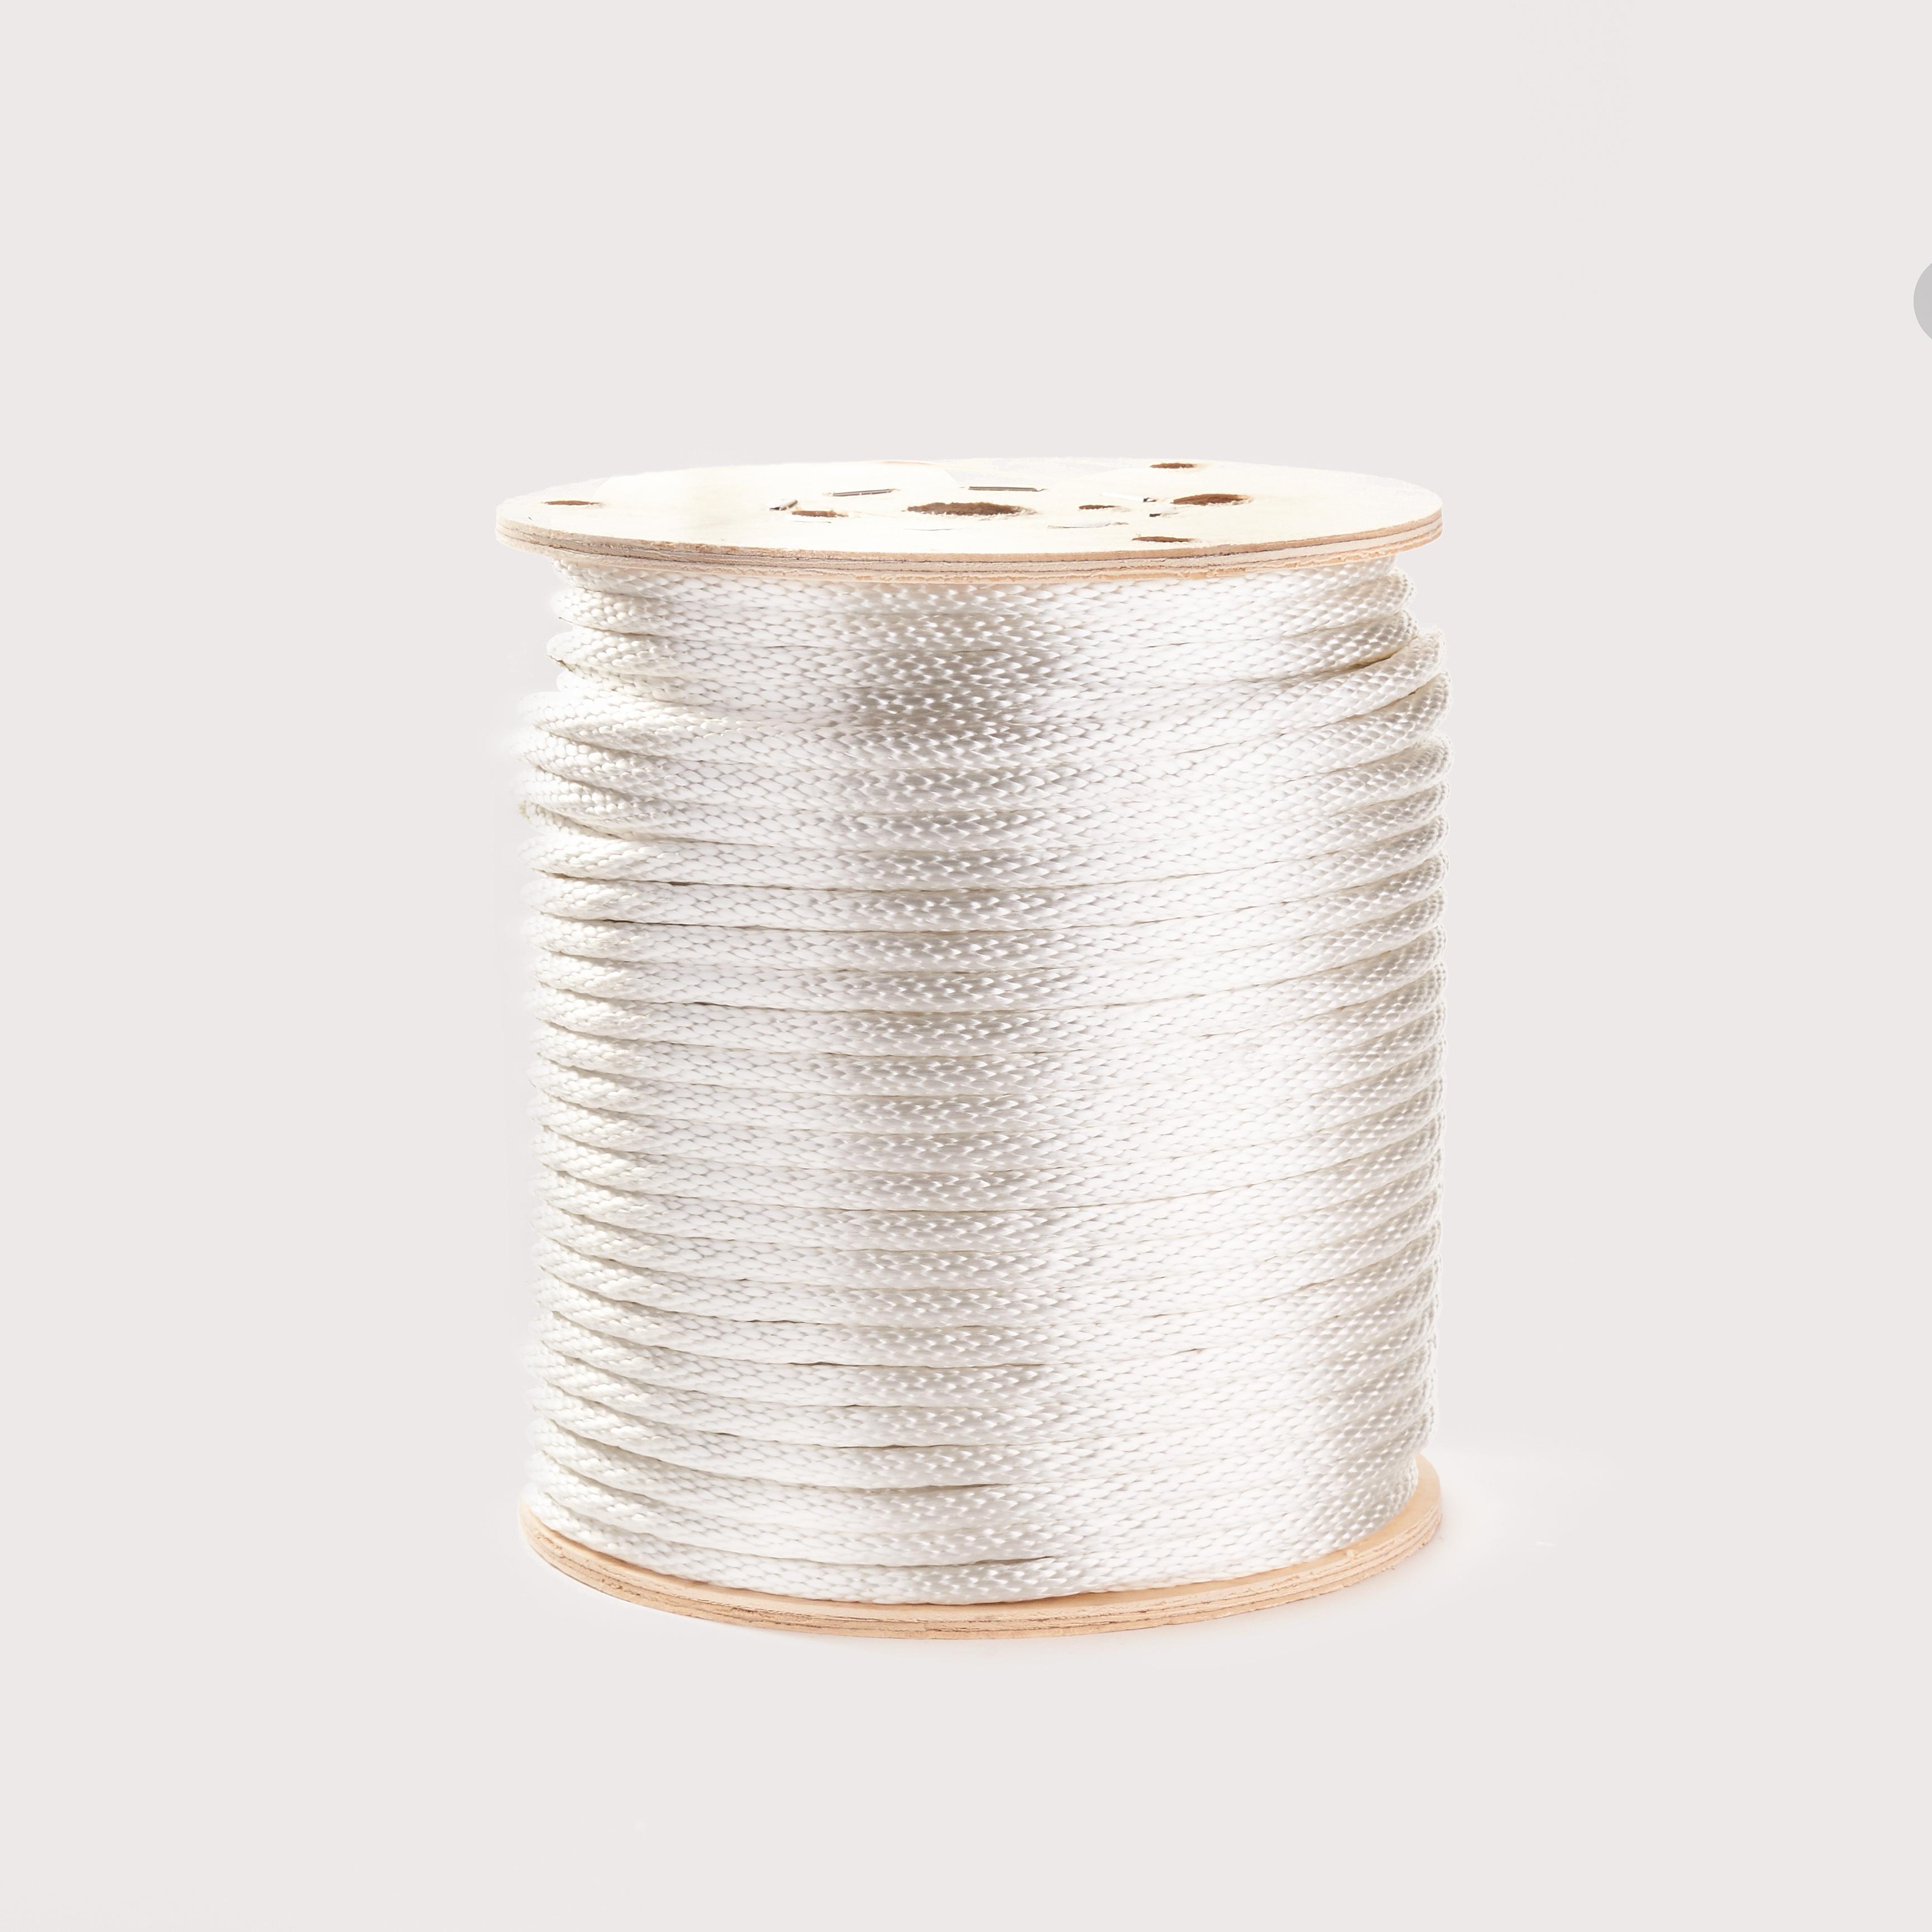 Orion-Cordage-Solid Braid Nylon-White-Reel14.jpg